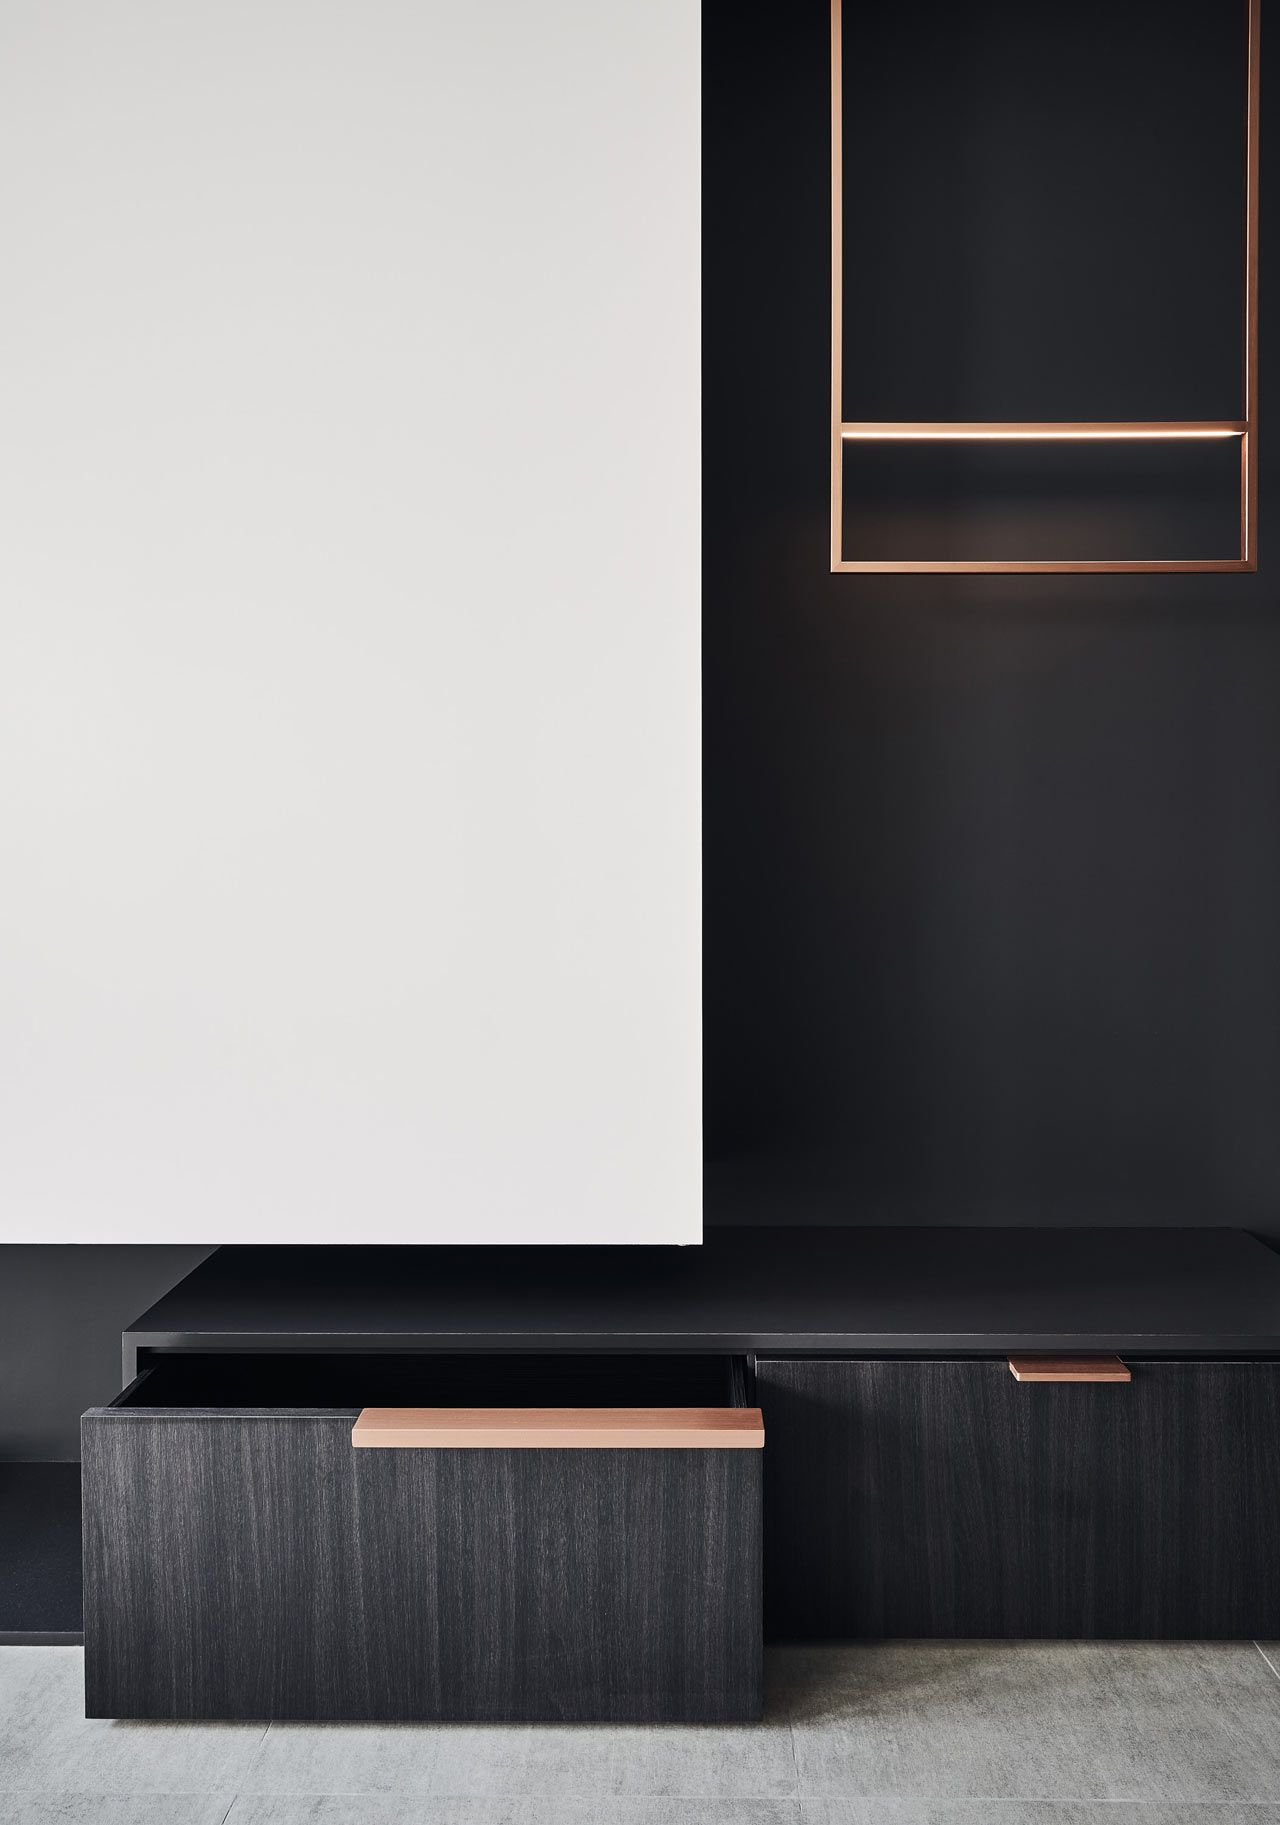 Cutaway Apartment Full Furnitures Modern Design: A Compact Taipei Apartment Full Of Curvy Details